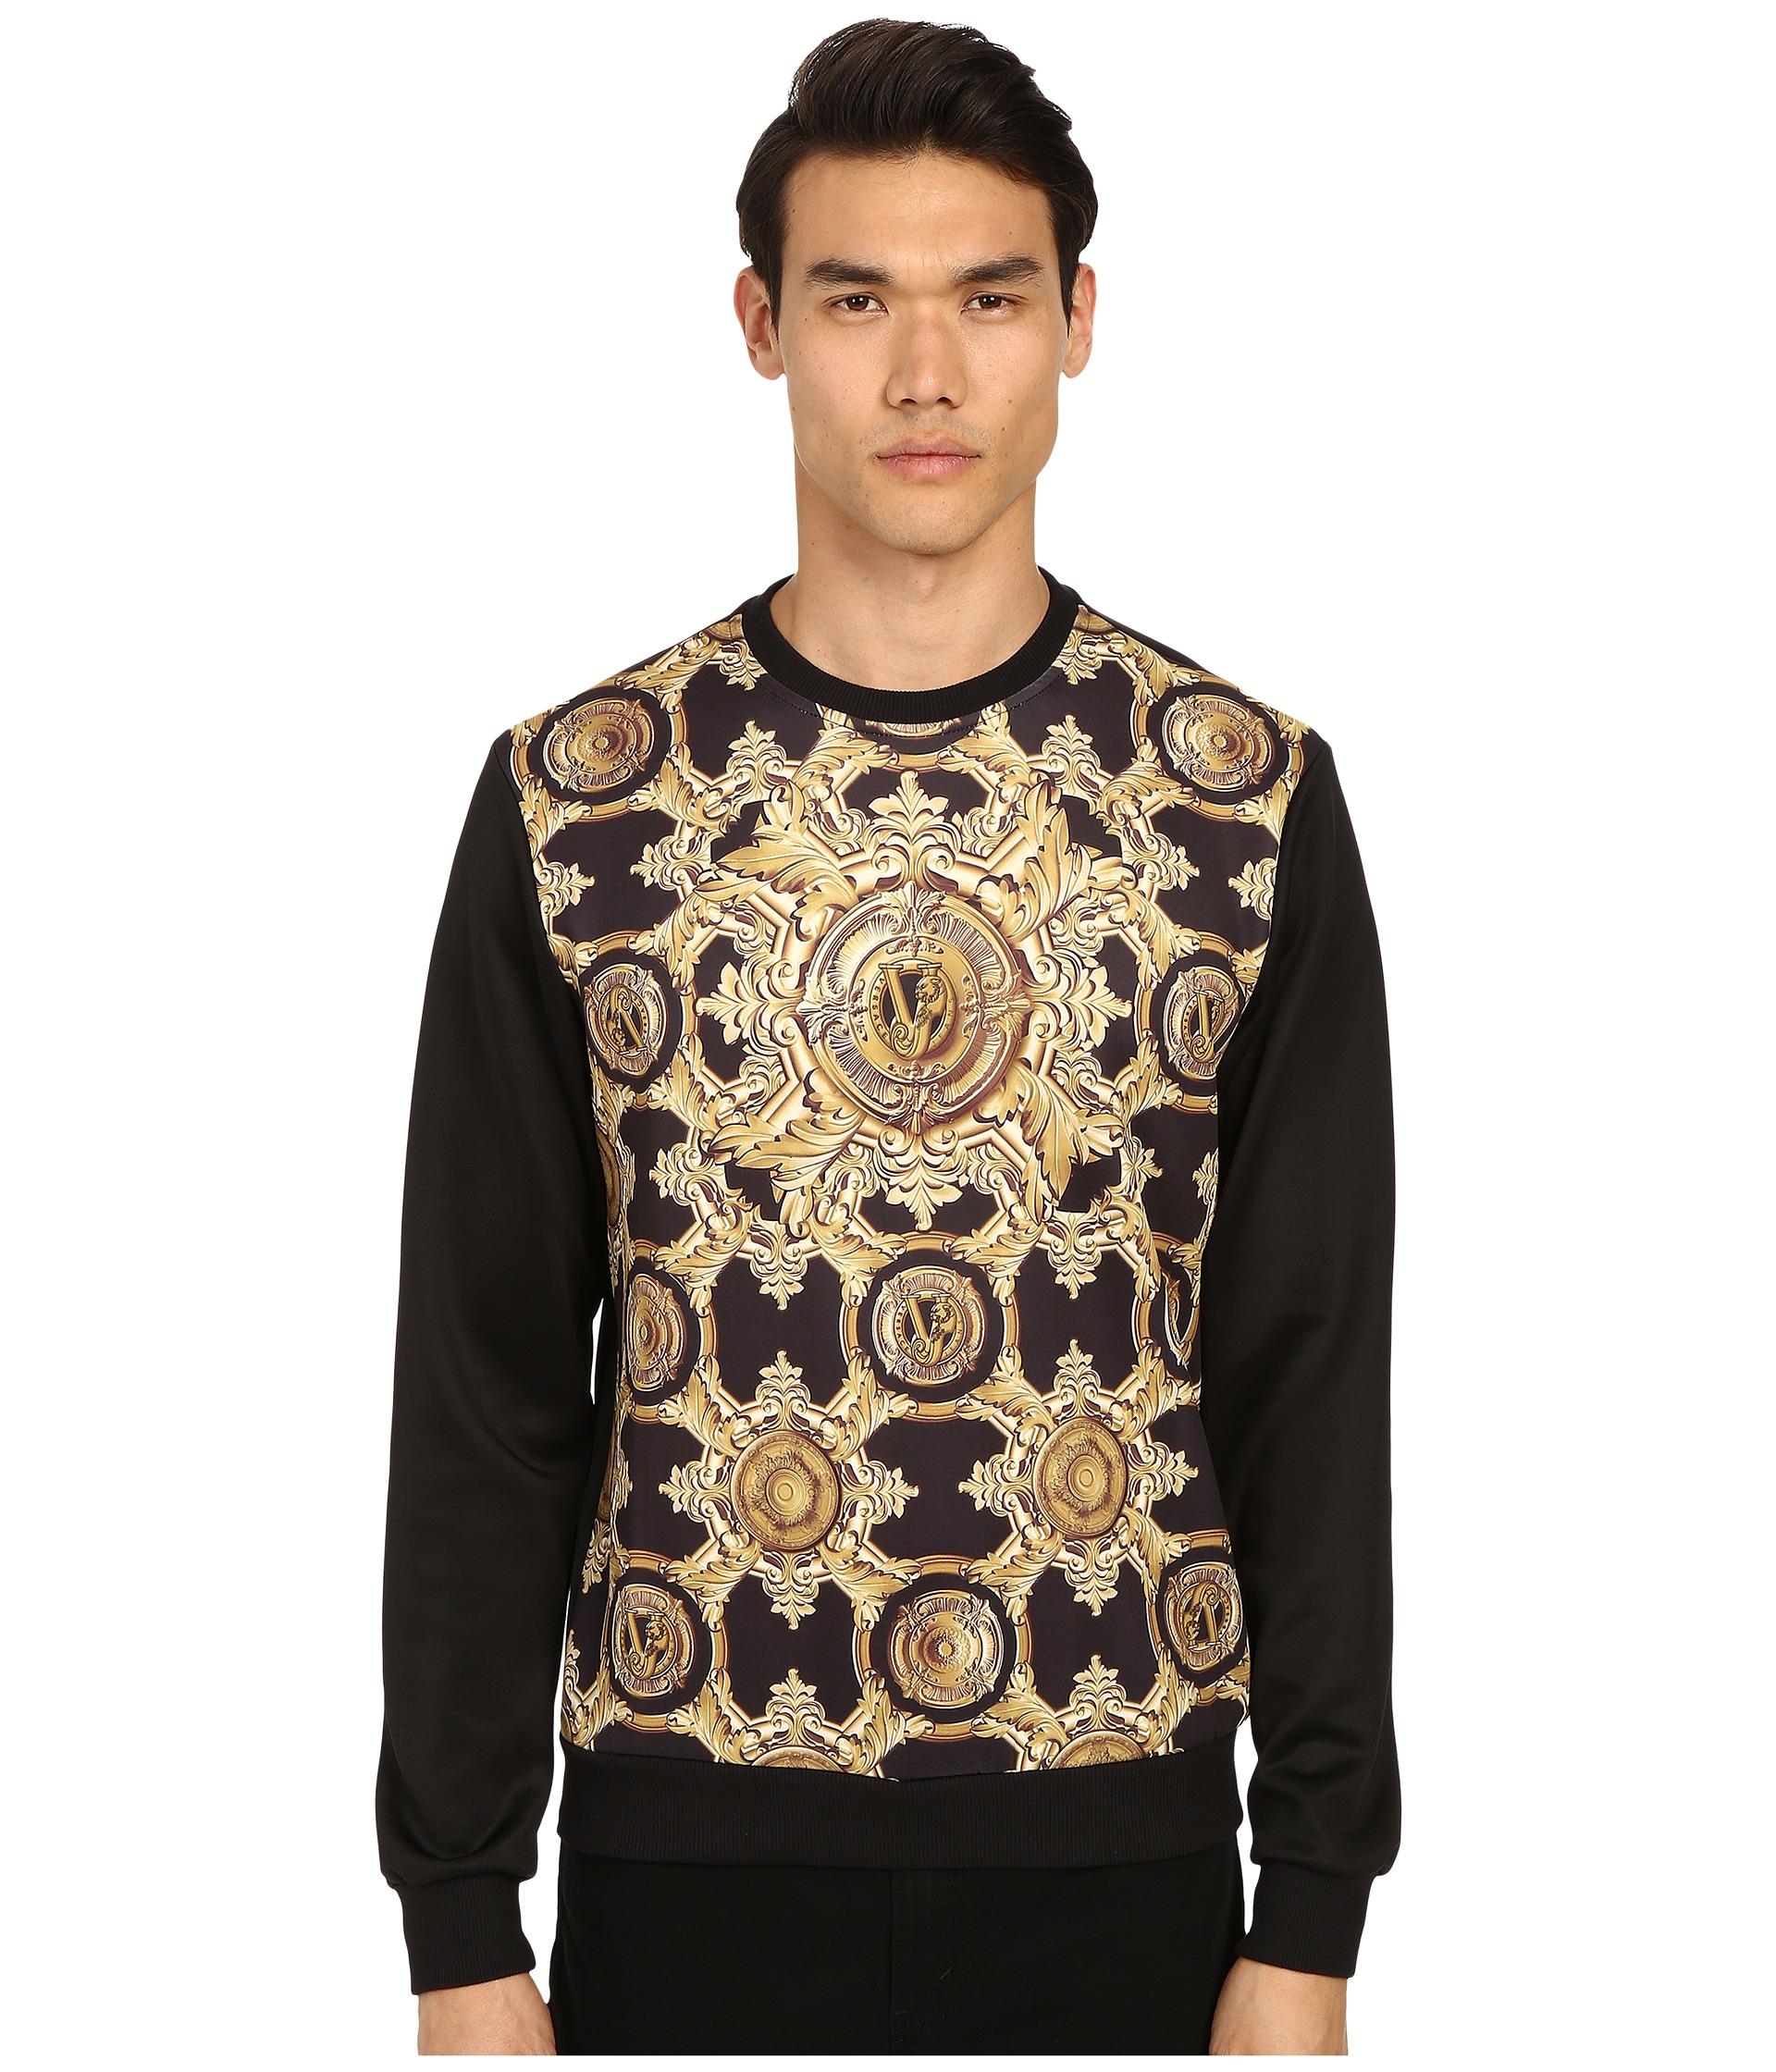 7ed37fa790 Versace Jeans Black And Gold Embroidered Logo Sweatshirt | Saddha